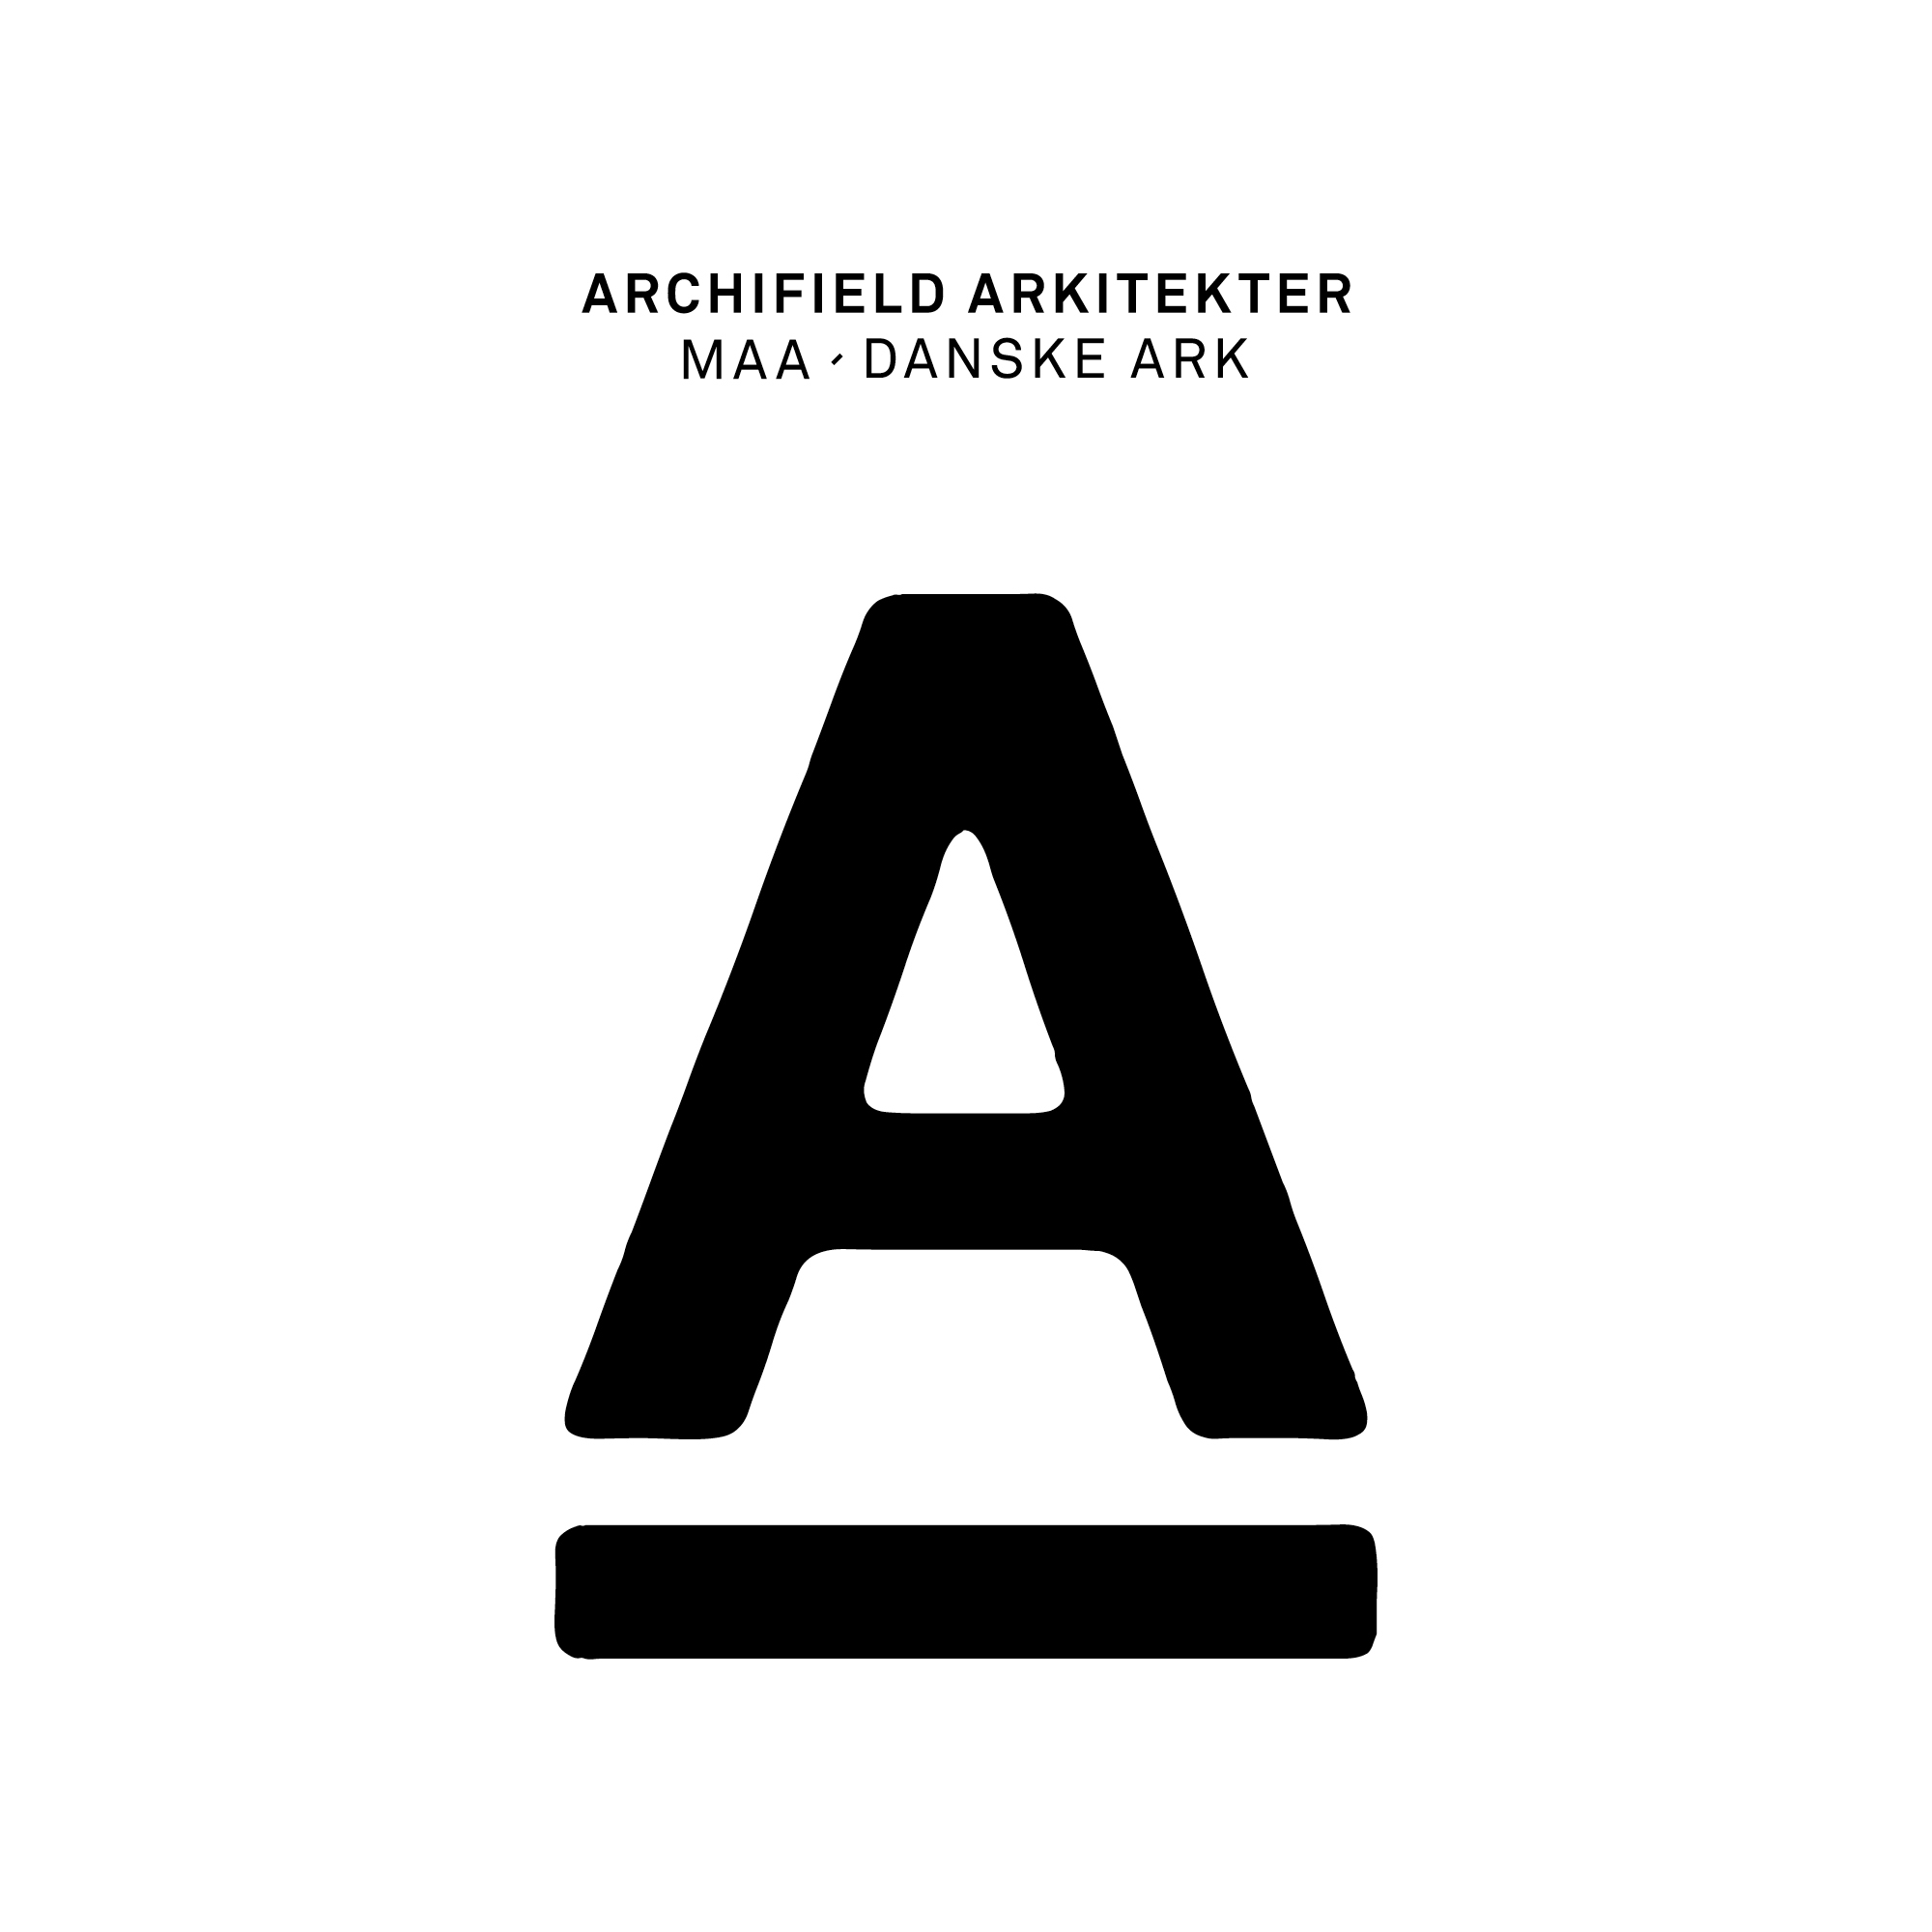 design_aark.jpg